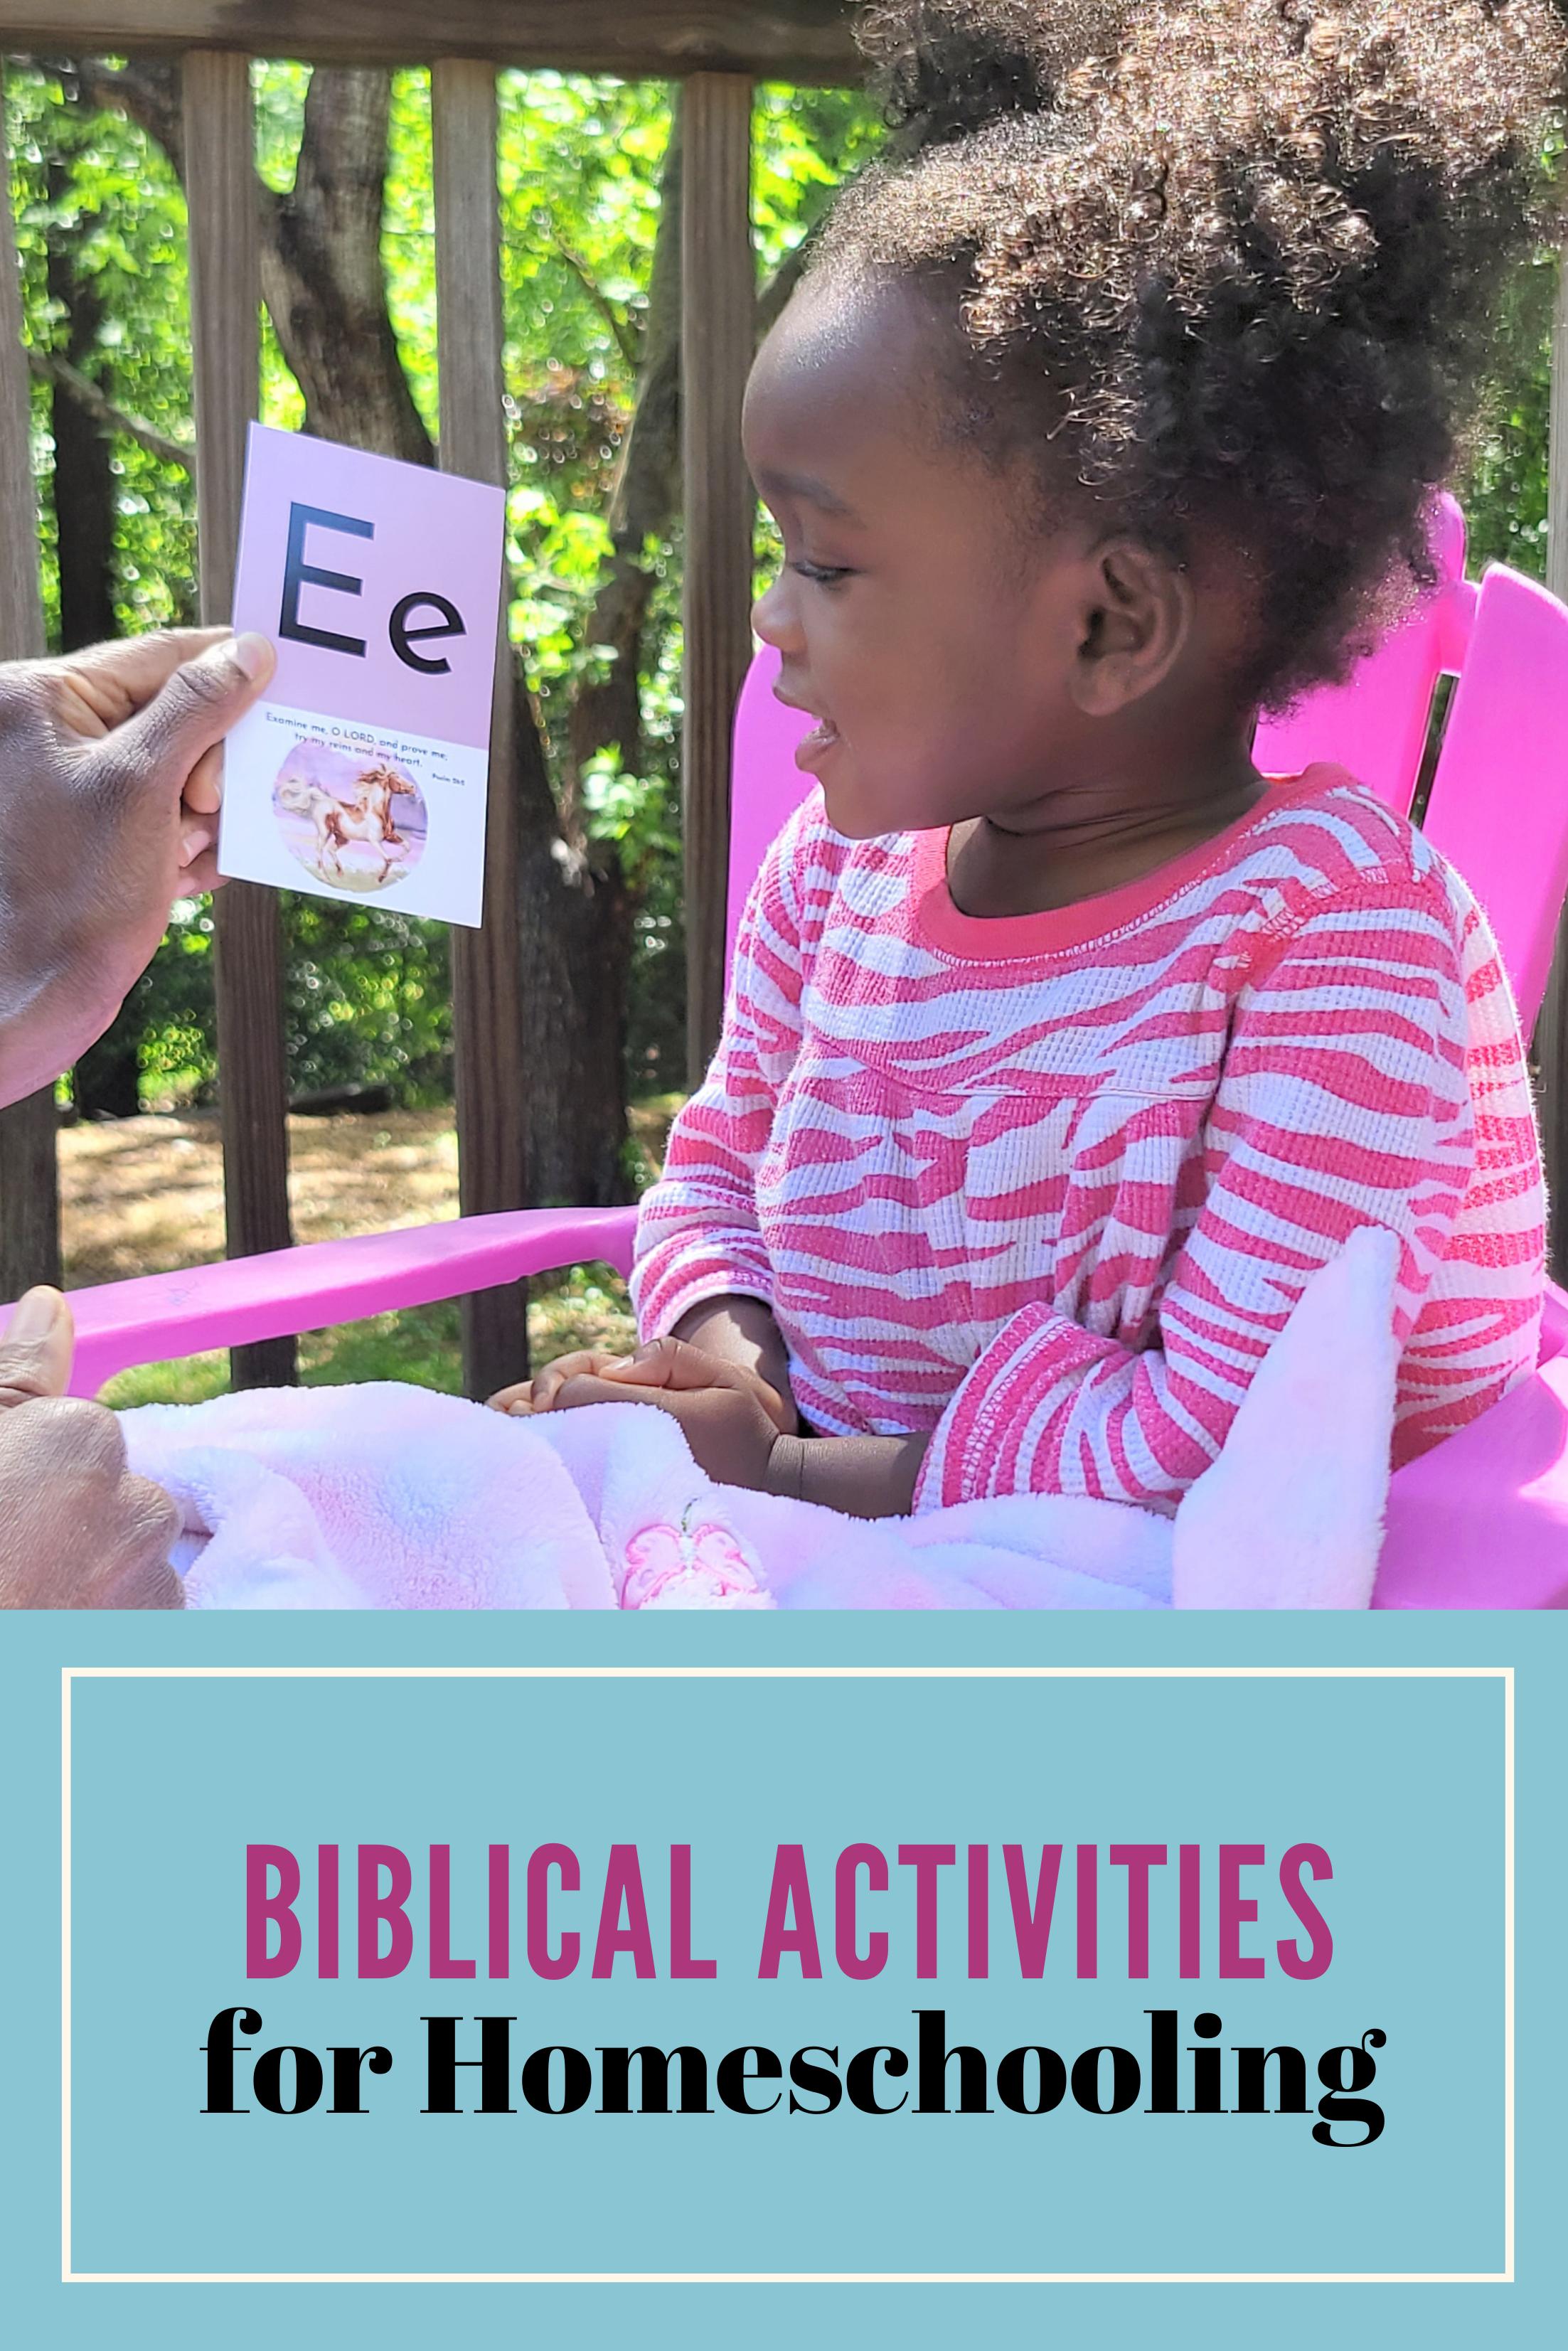 ideas for Biblical Activities for homeschooling